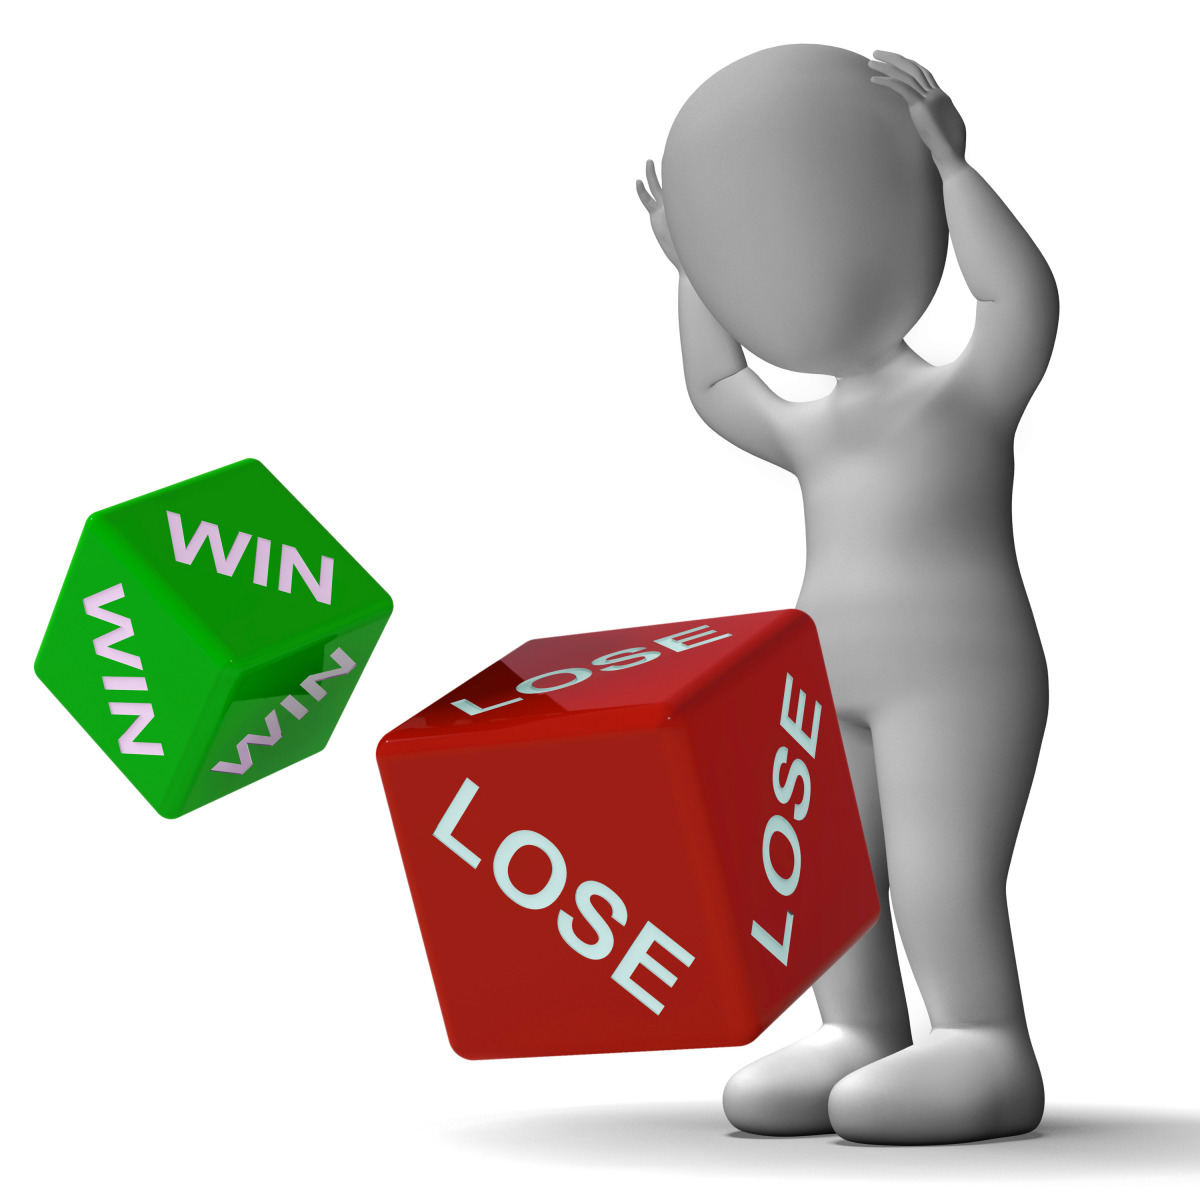 win_lose.jpg